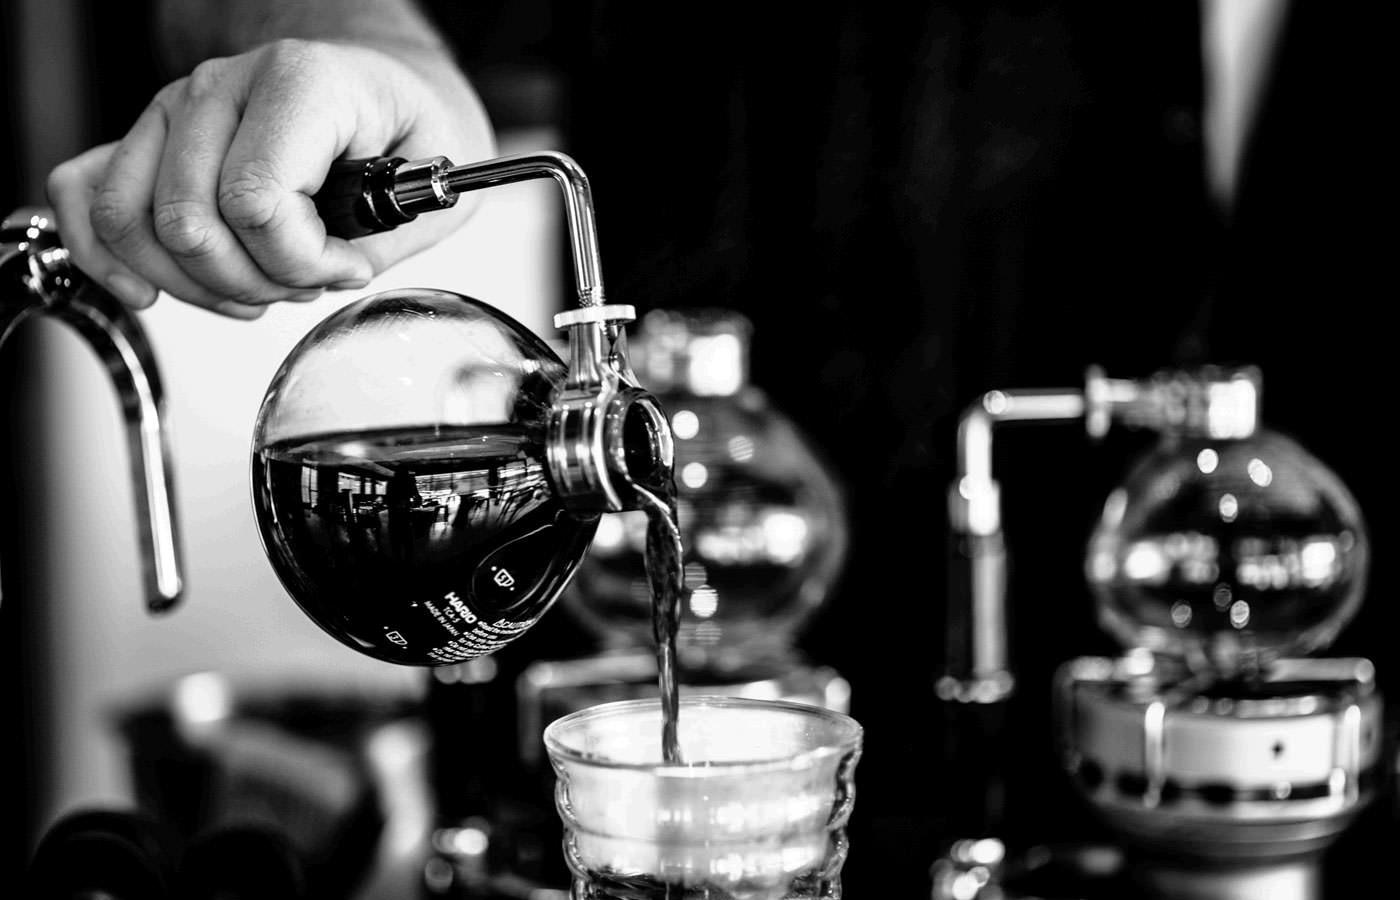 http://pixgood.com/siphon-coffee.html   pixgood - sifon kahve tarifi